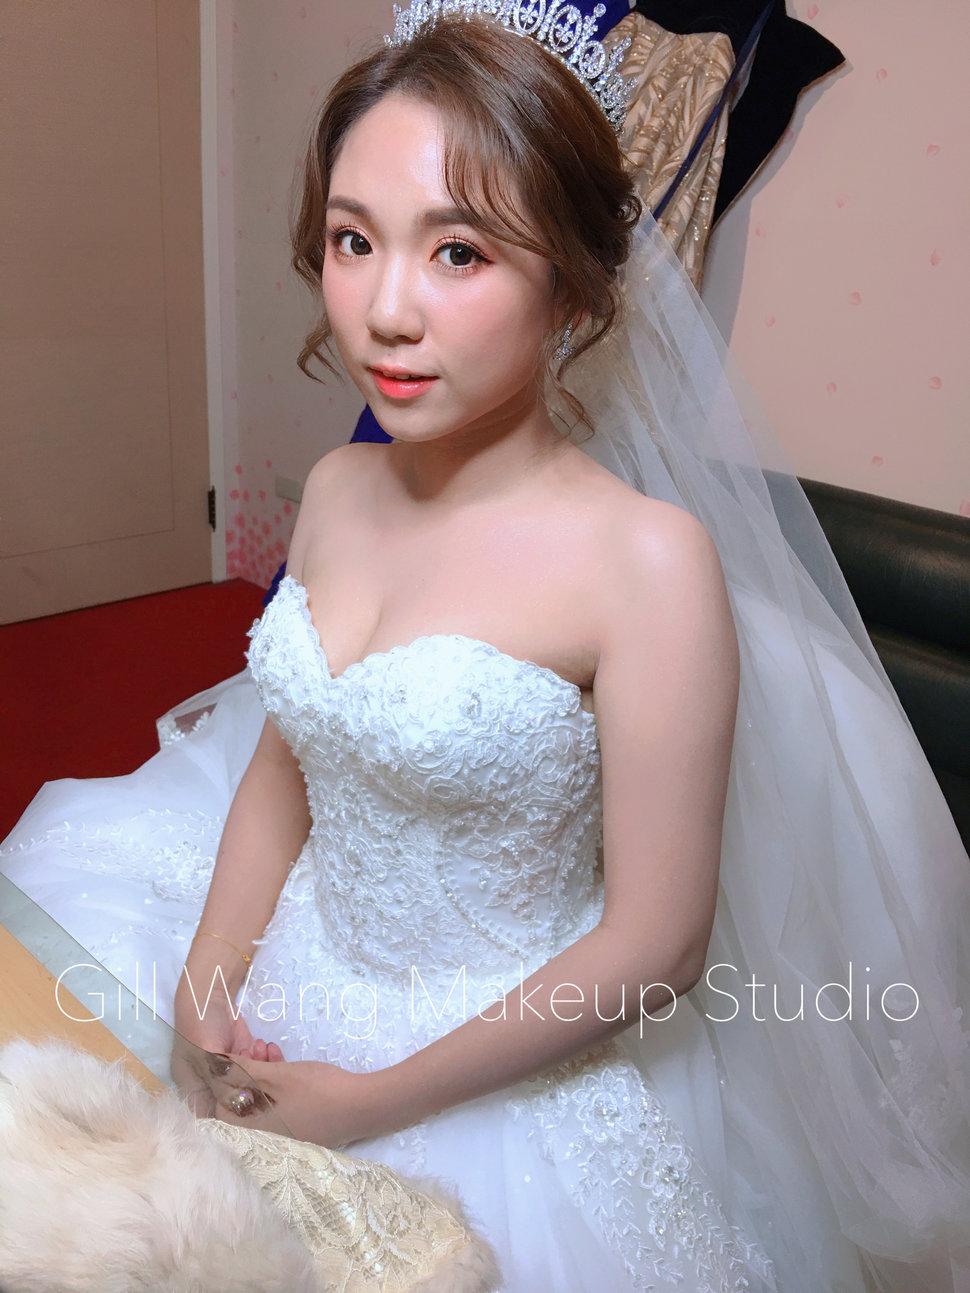 IMG_2716 - Gill-小珺《結婚吧》